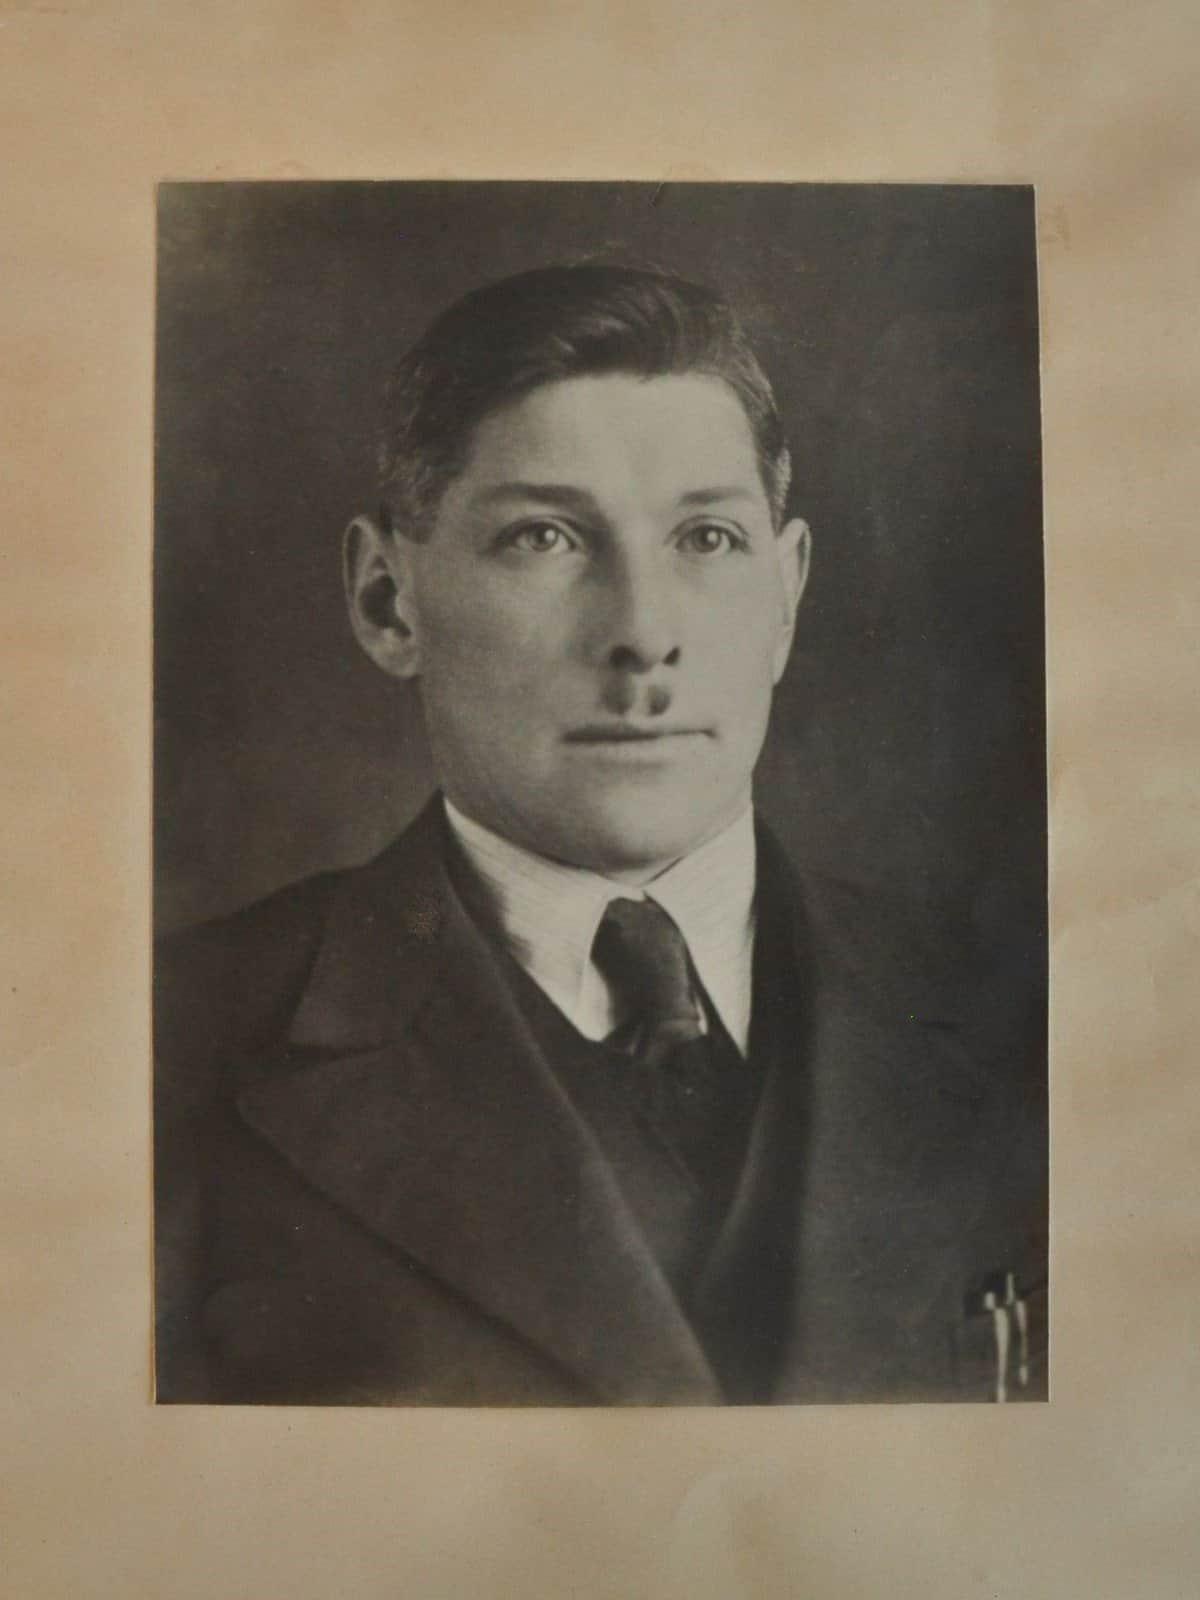 Josef Kerschhaggl